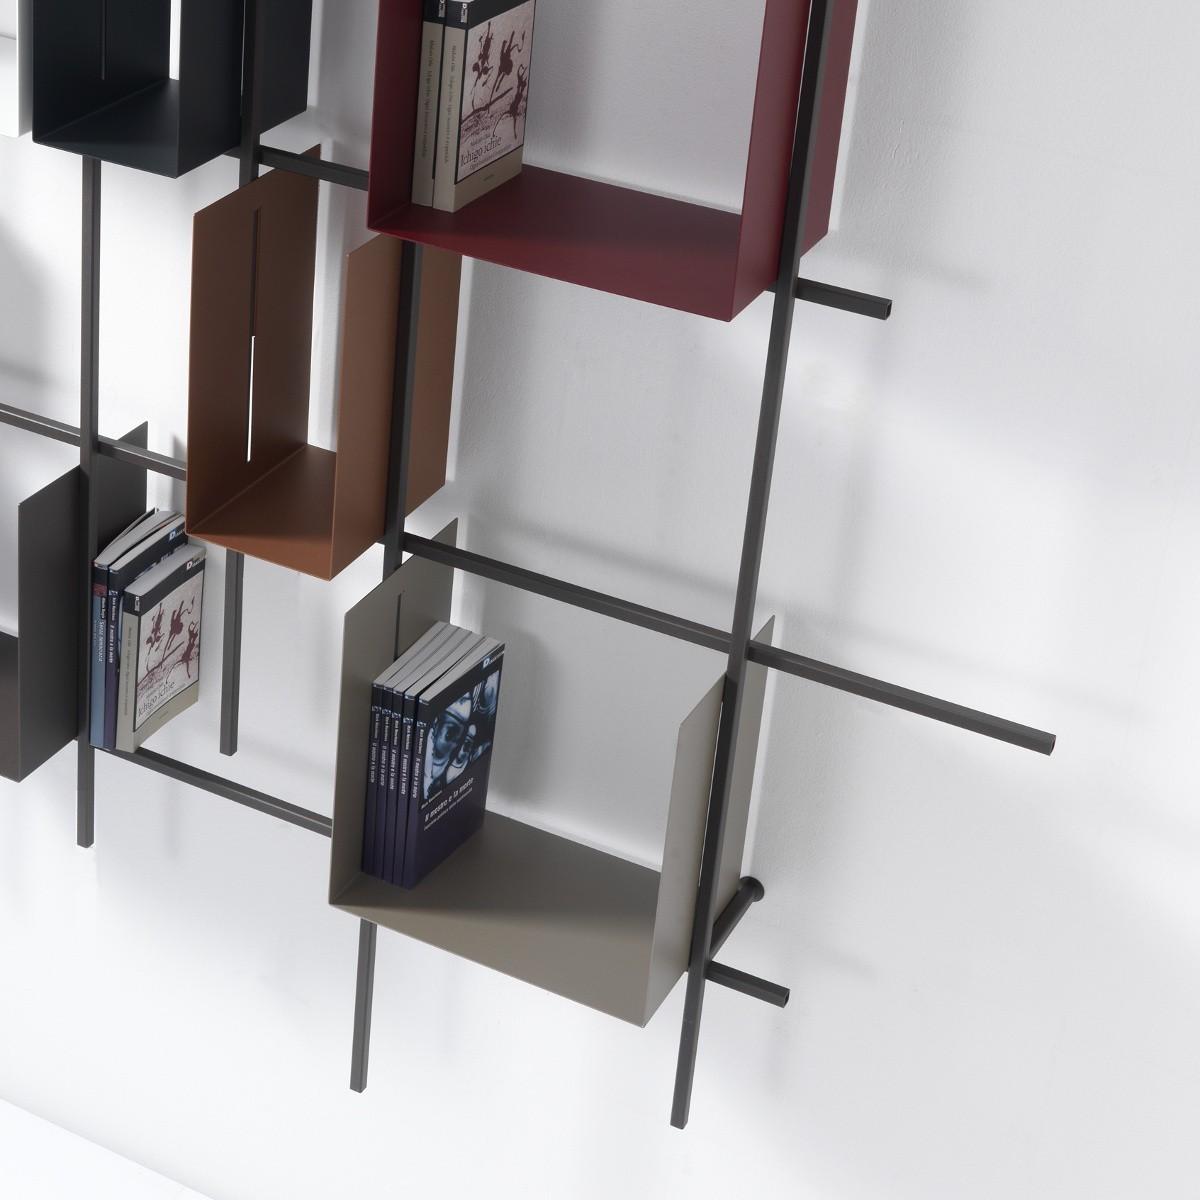 Libreria a parete moderna in acciaio tubolare libra2 for Parete decorata moderna